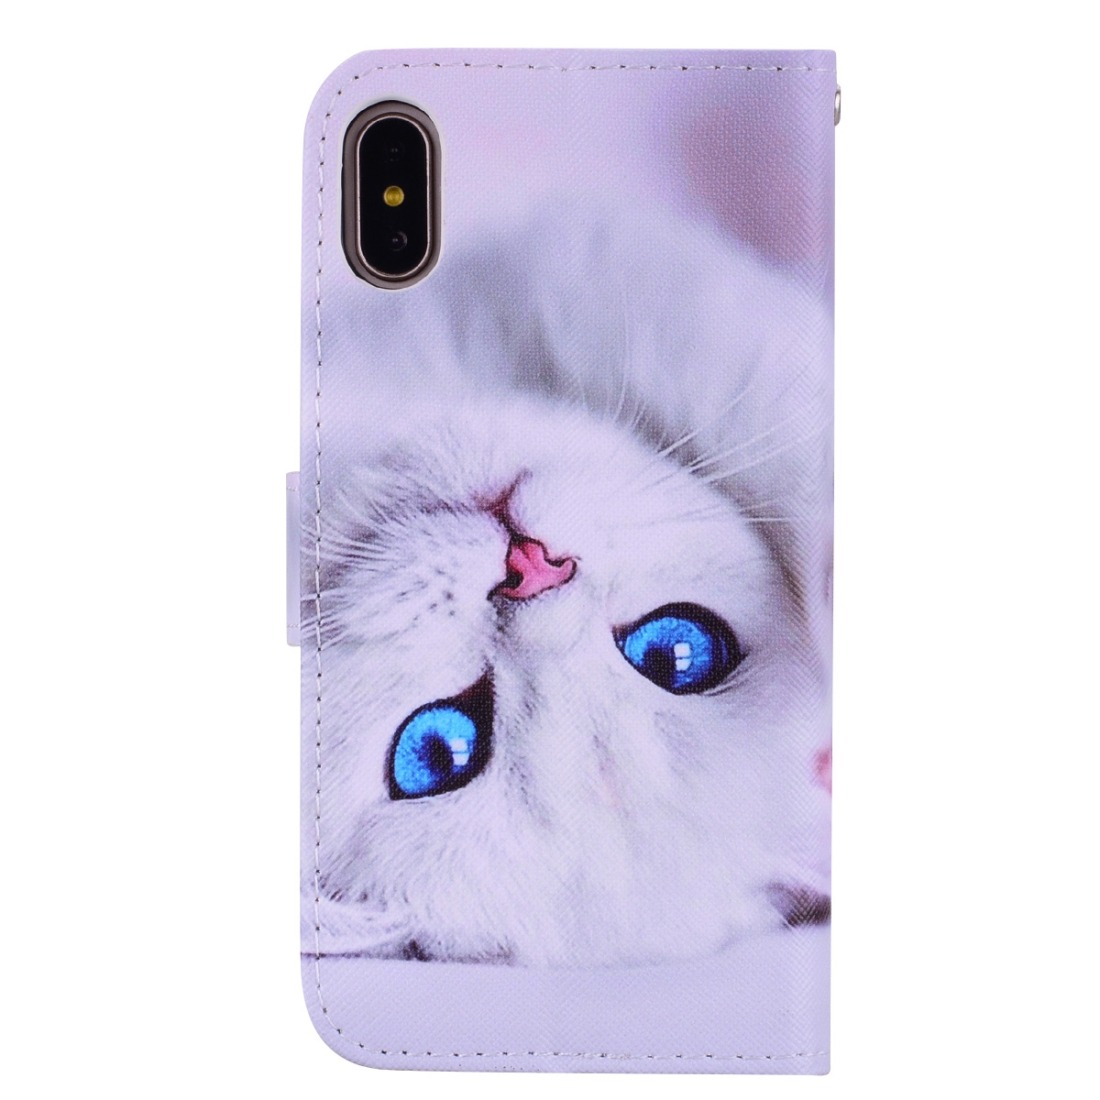 Branco Gato Padrao Colorido Desenho Horizontal Sacudidela C R